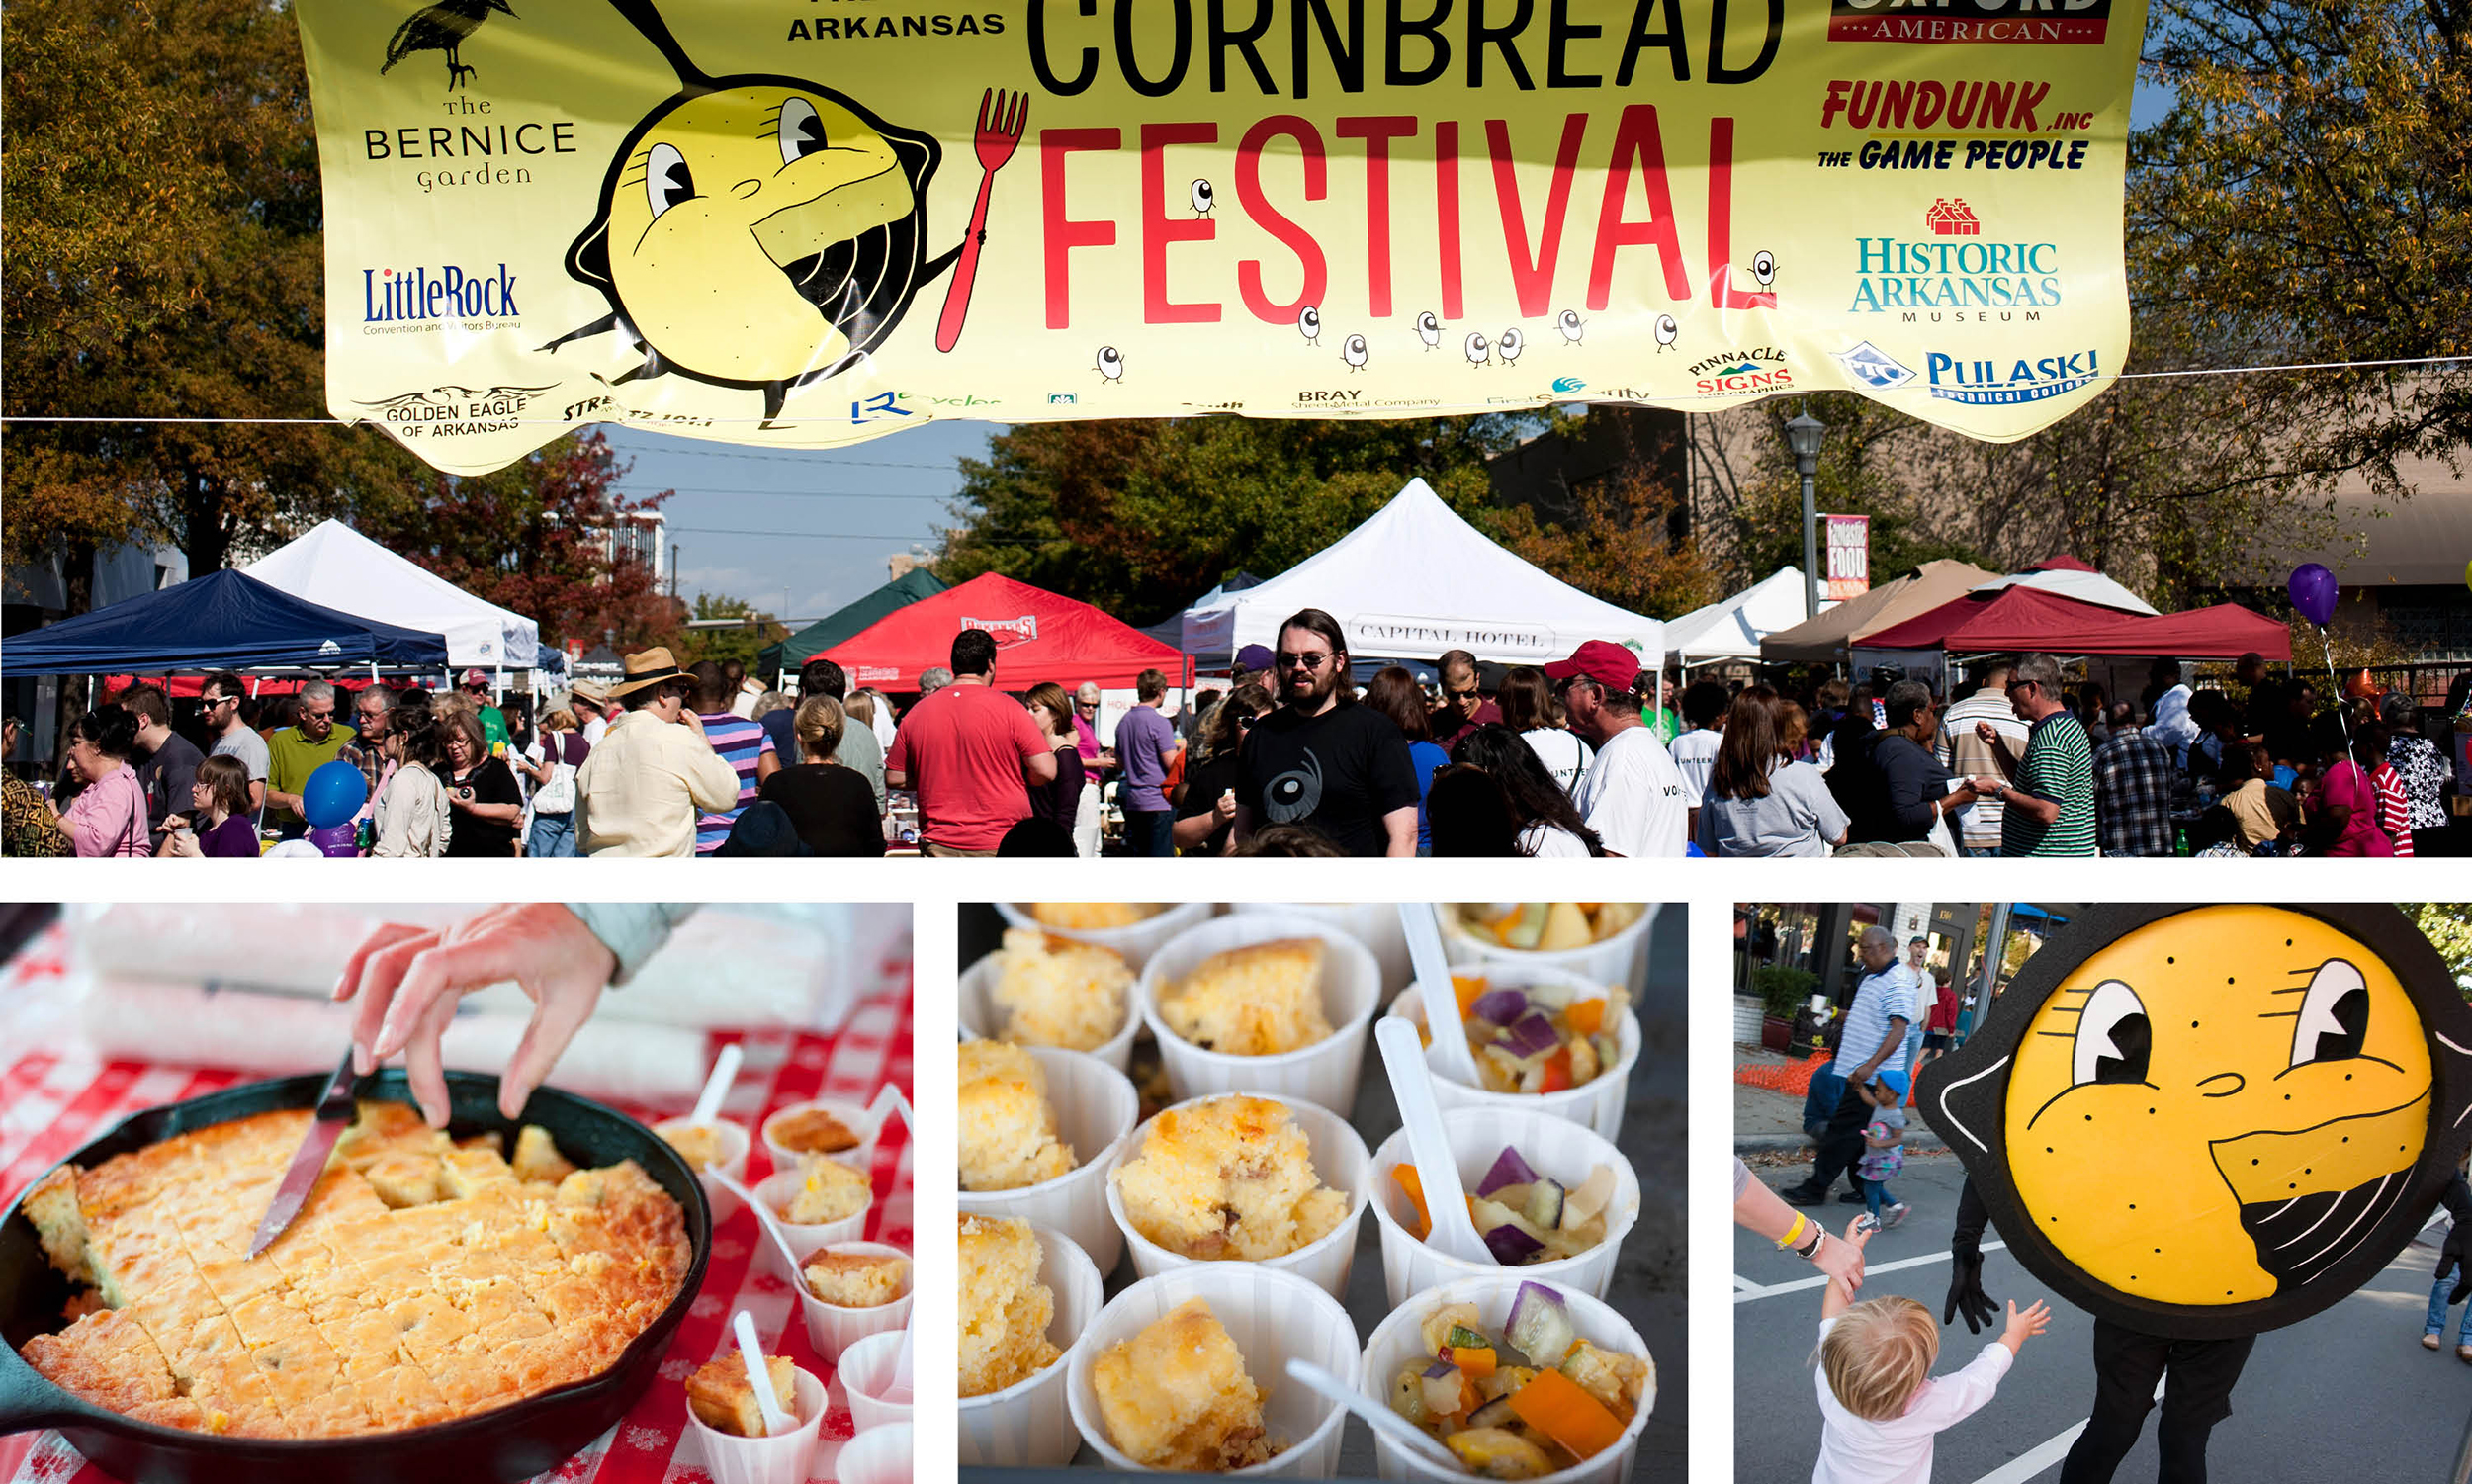 Cornbread Festival Pic.jpg